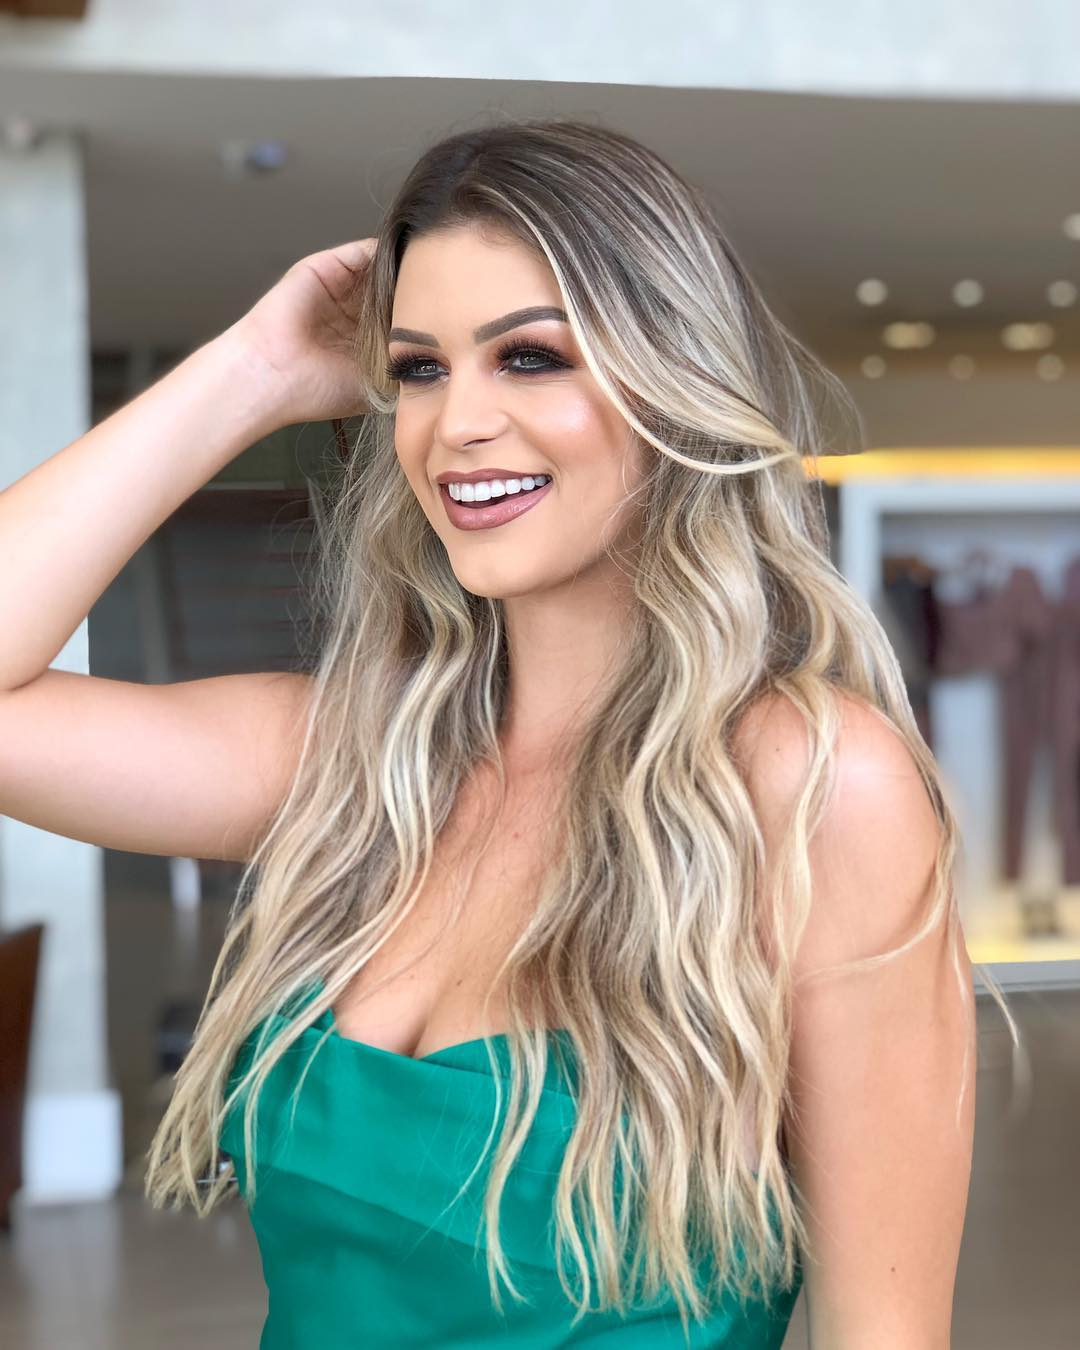 maria gabriela batistela, miss brasil terra 2019. - Página 5 54217510